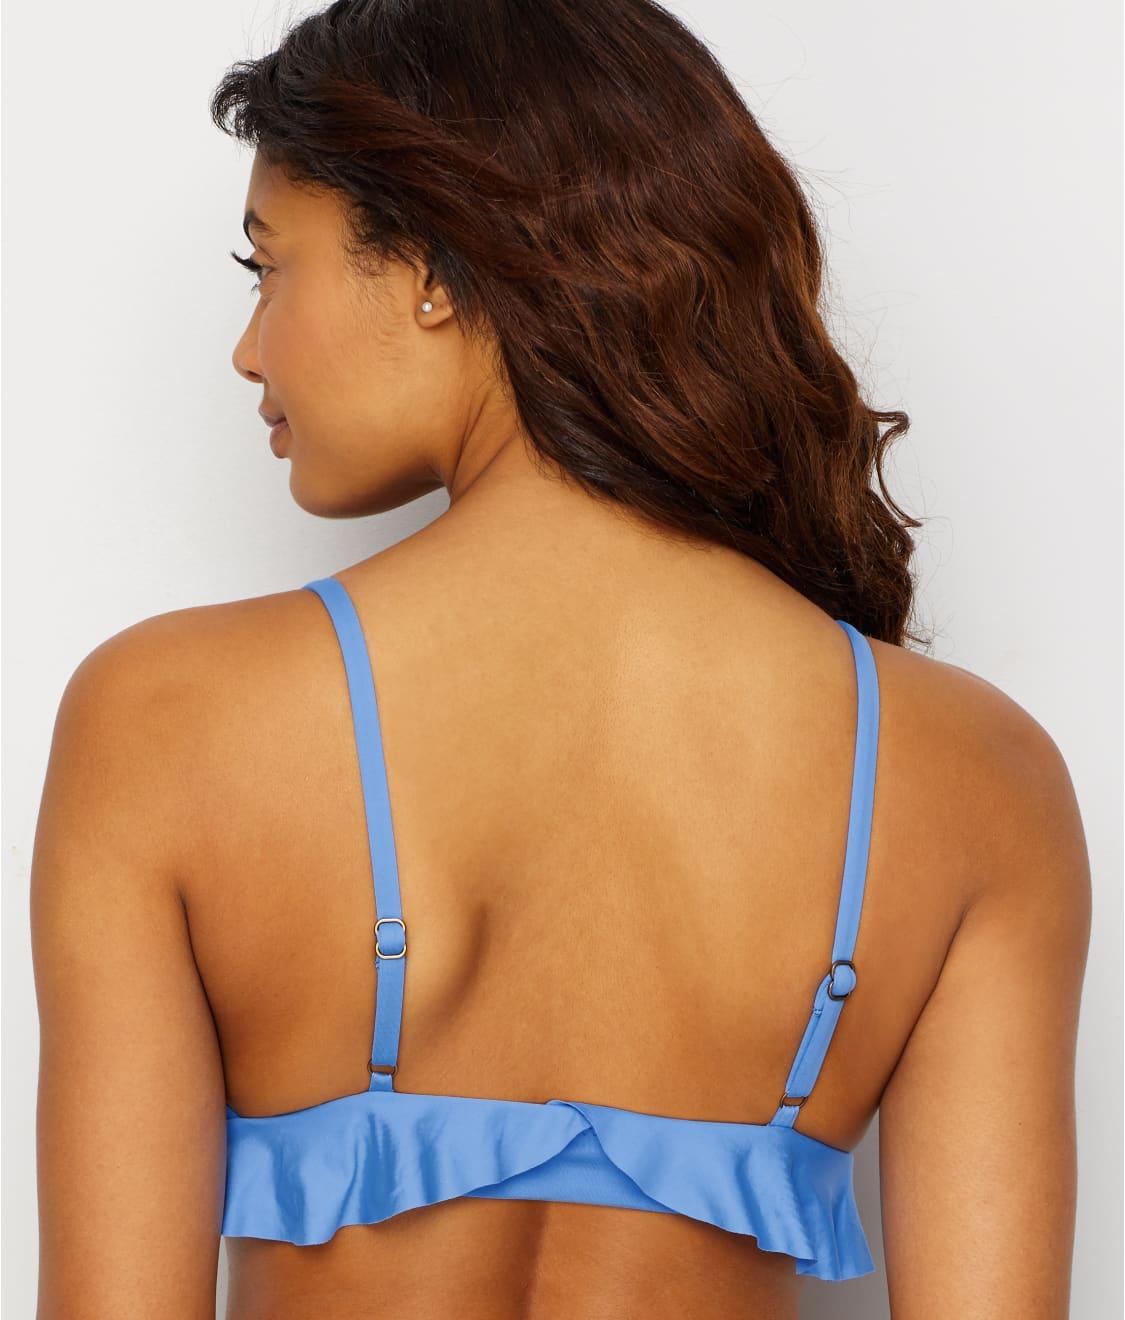 6f699019dc Becca Socialite Ruffle Bikini Top | Bare Necessities (193197)